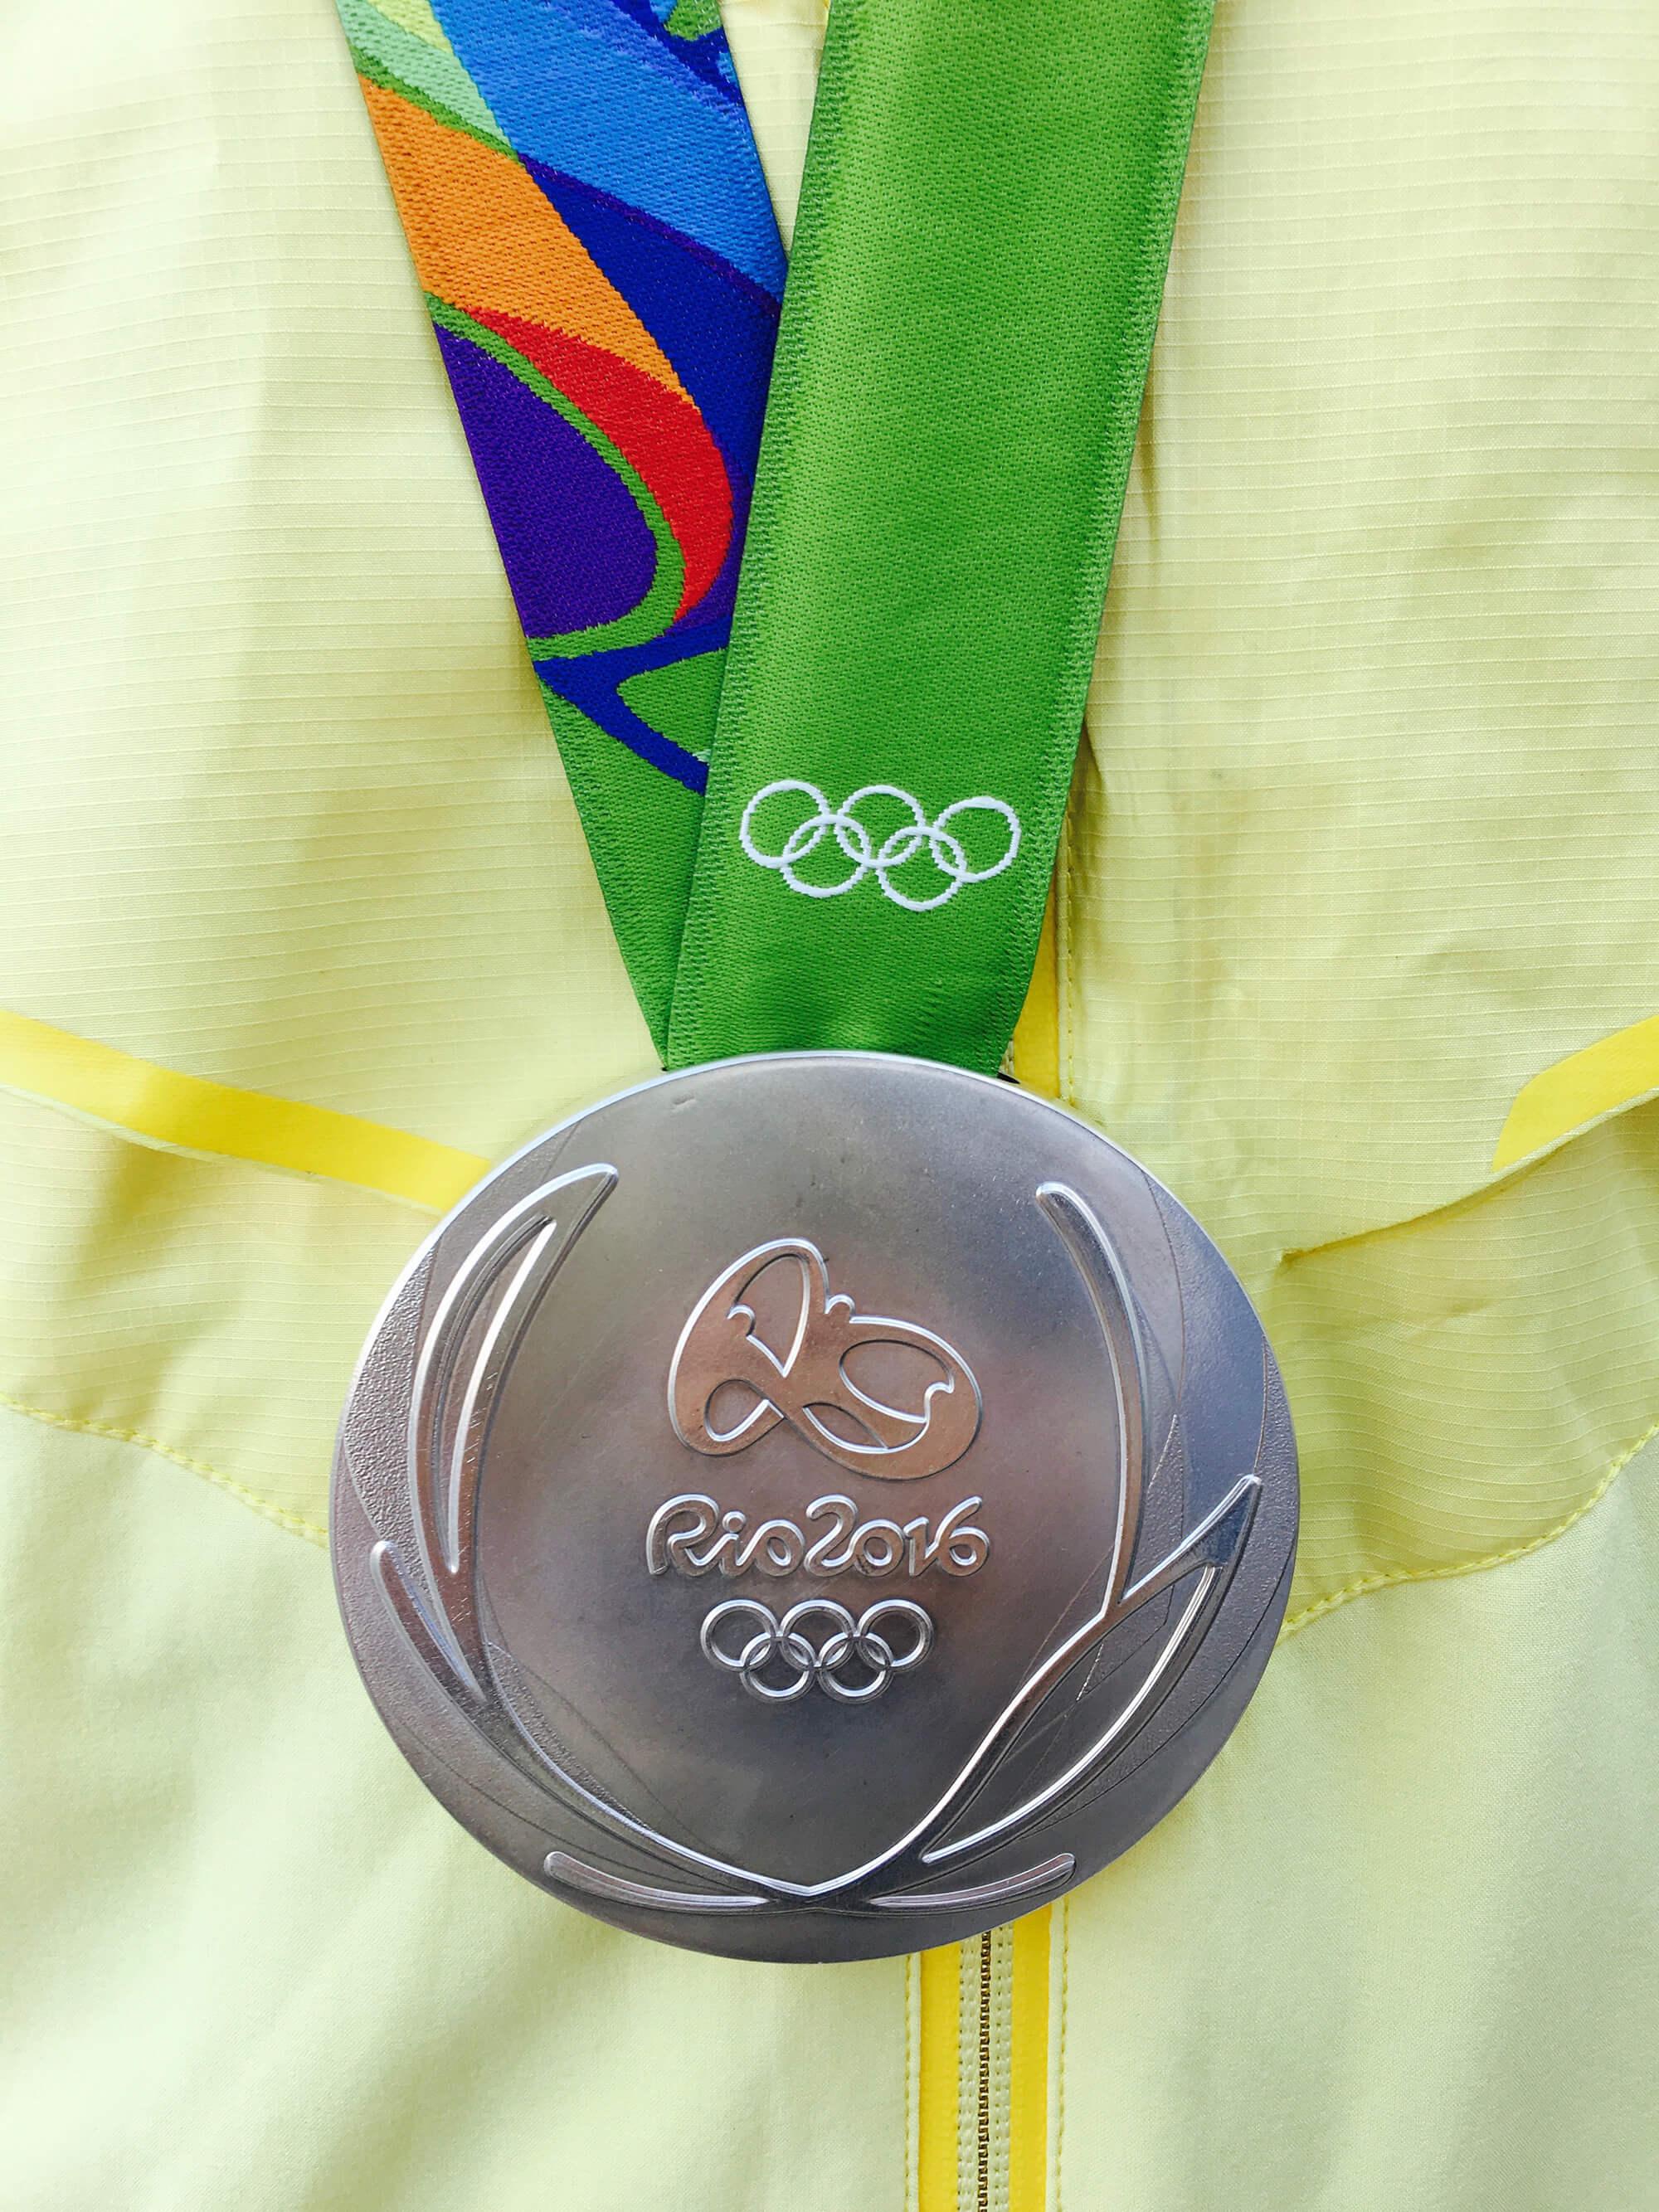 OS-silvermedaj från Rio